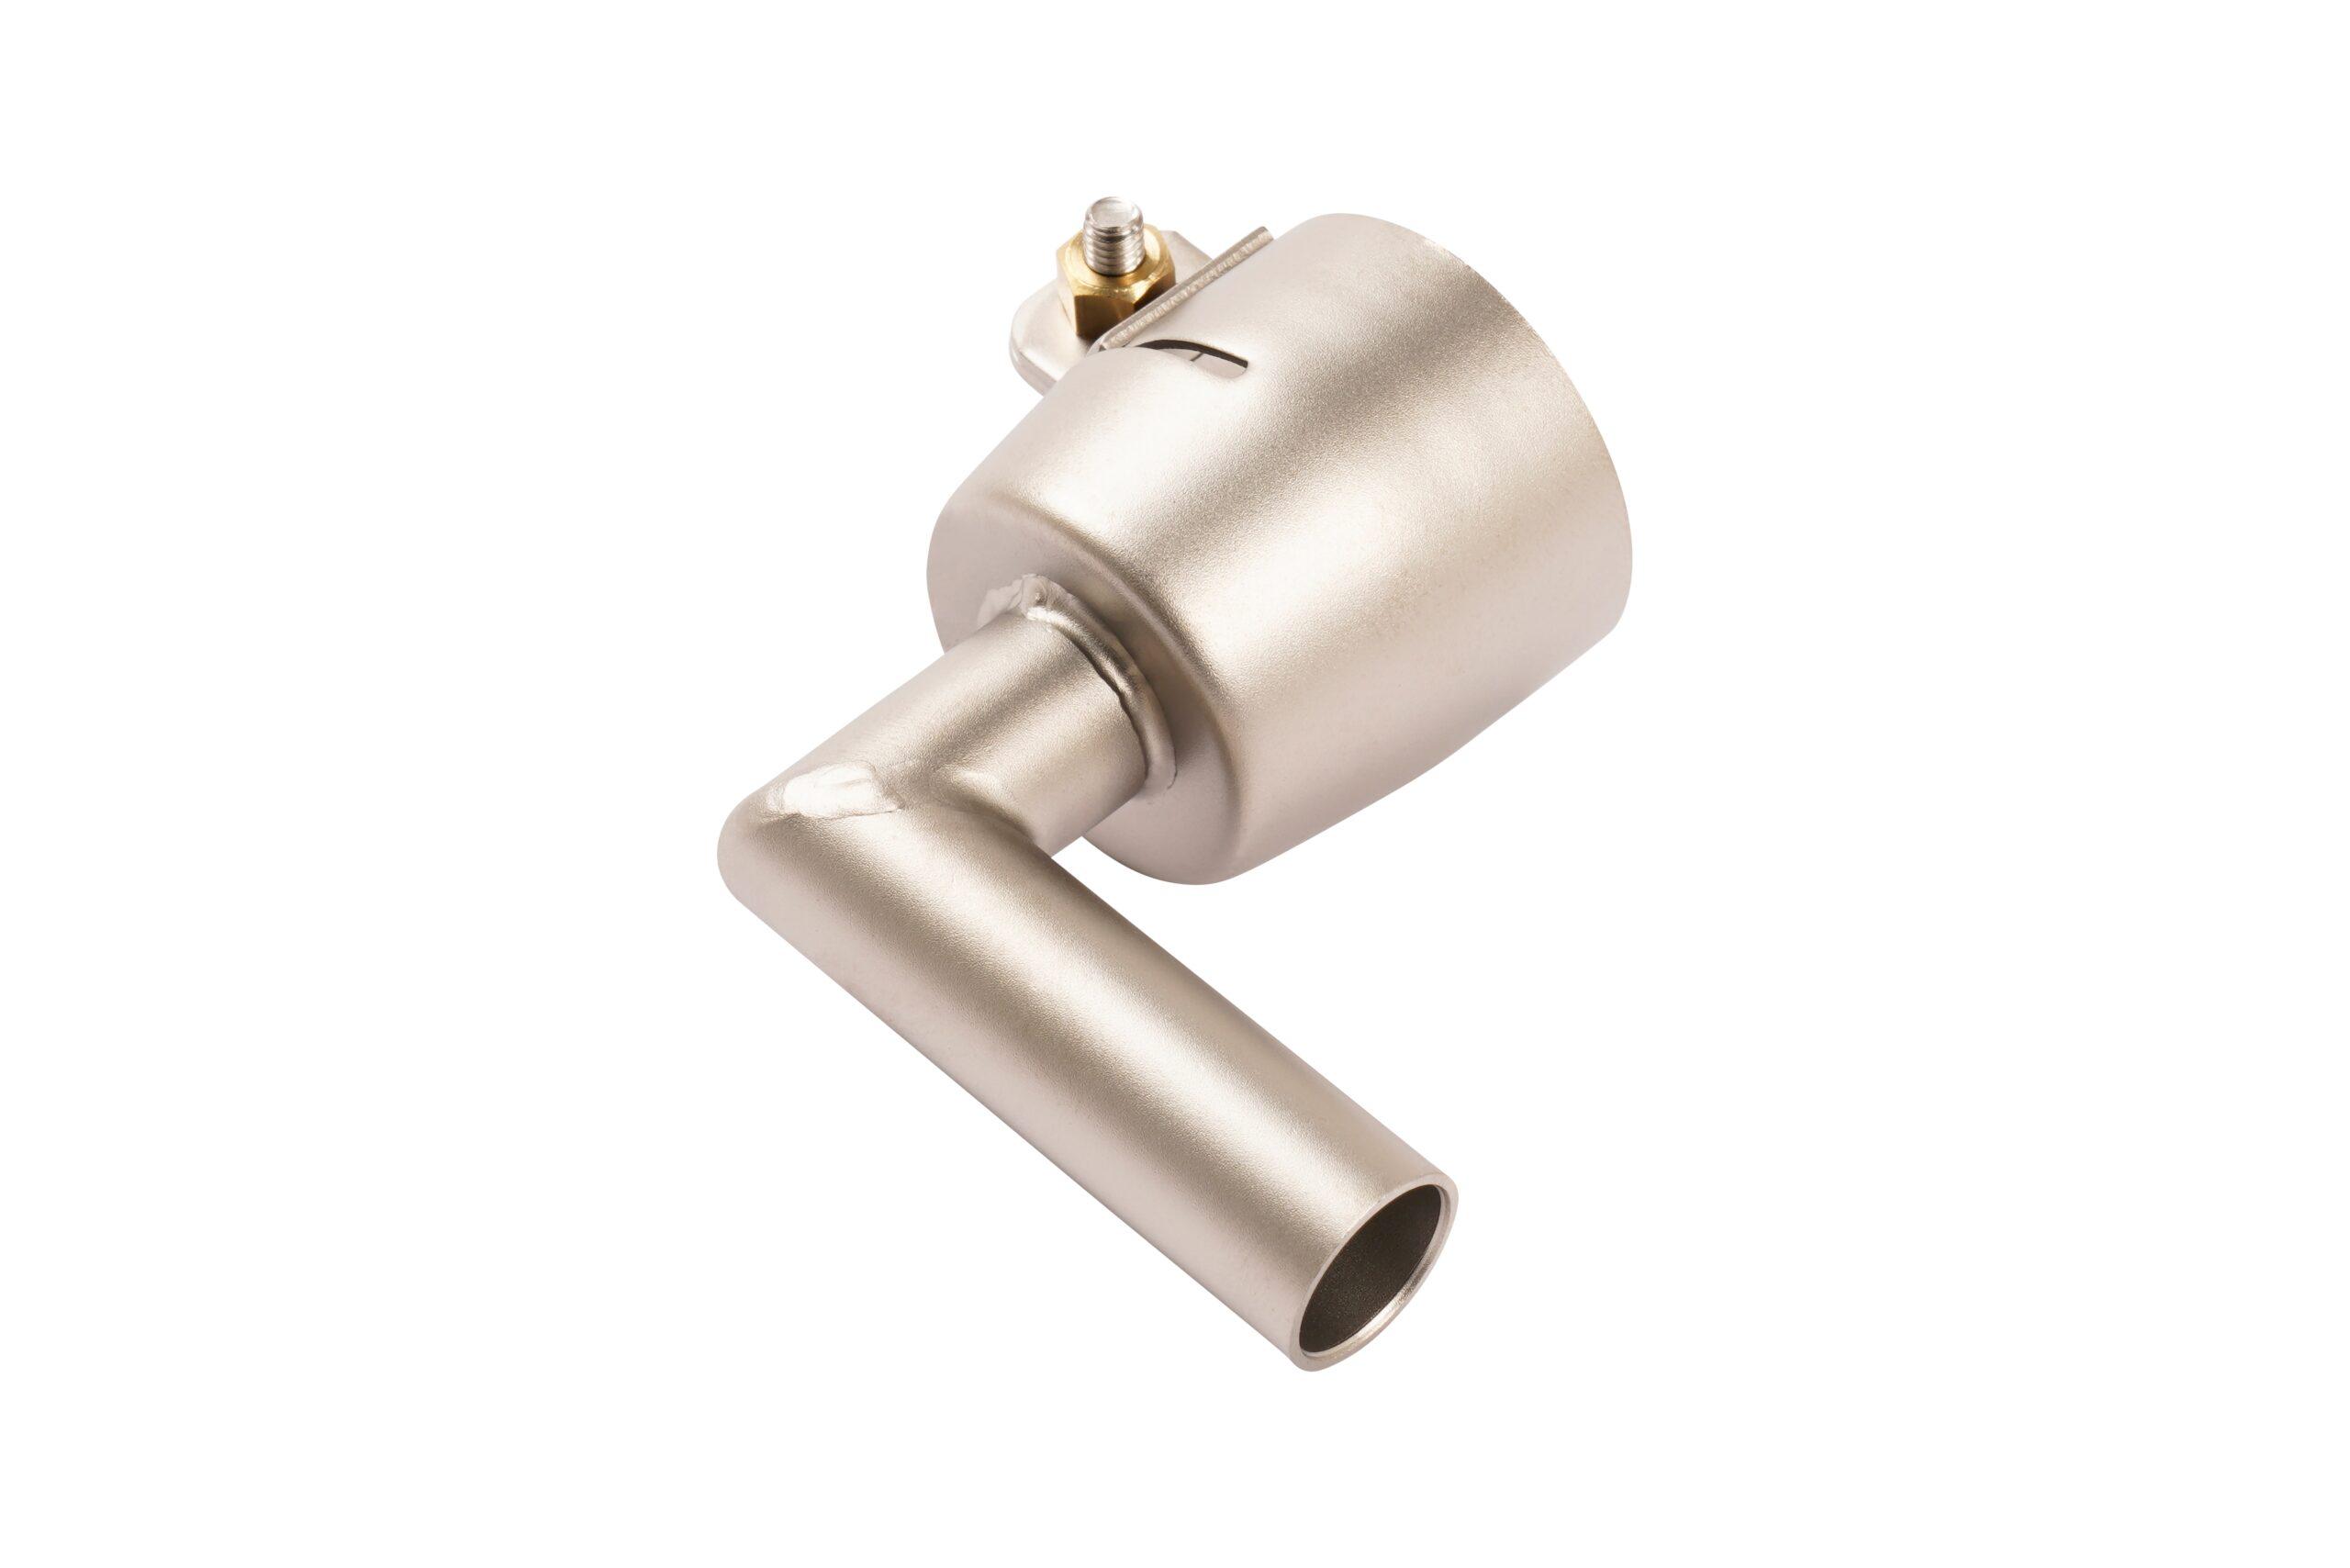 Dysza rurowa Ø14 mm, 25x50 mm, wygięta 90°, (wlot Ø32 mm) - 105.514